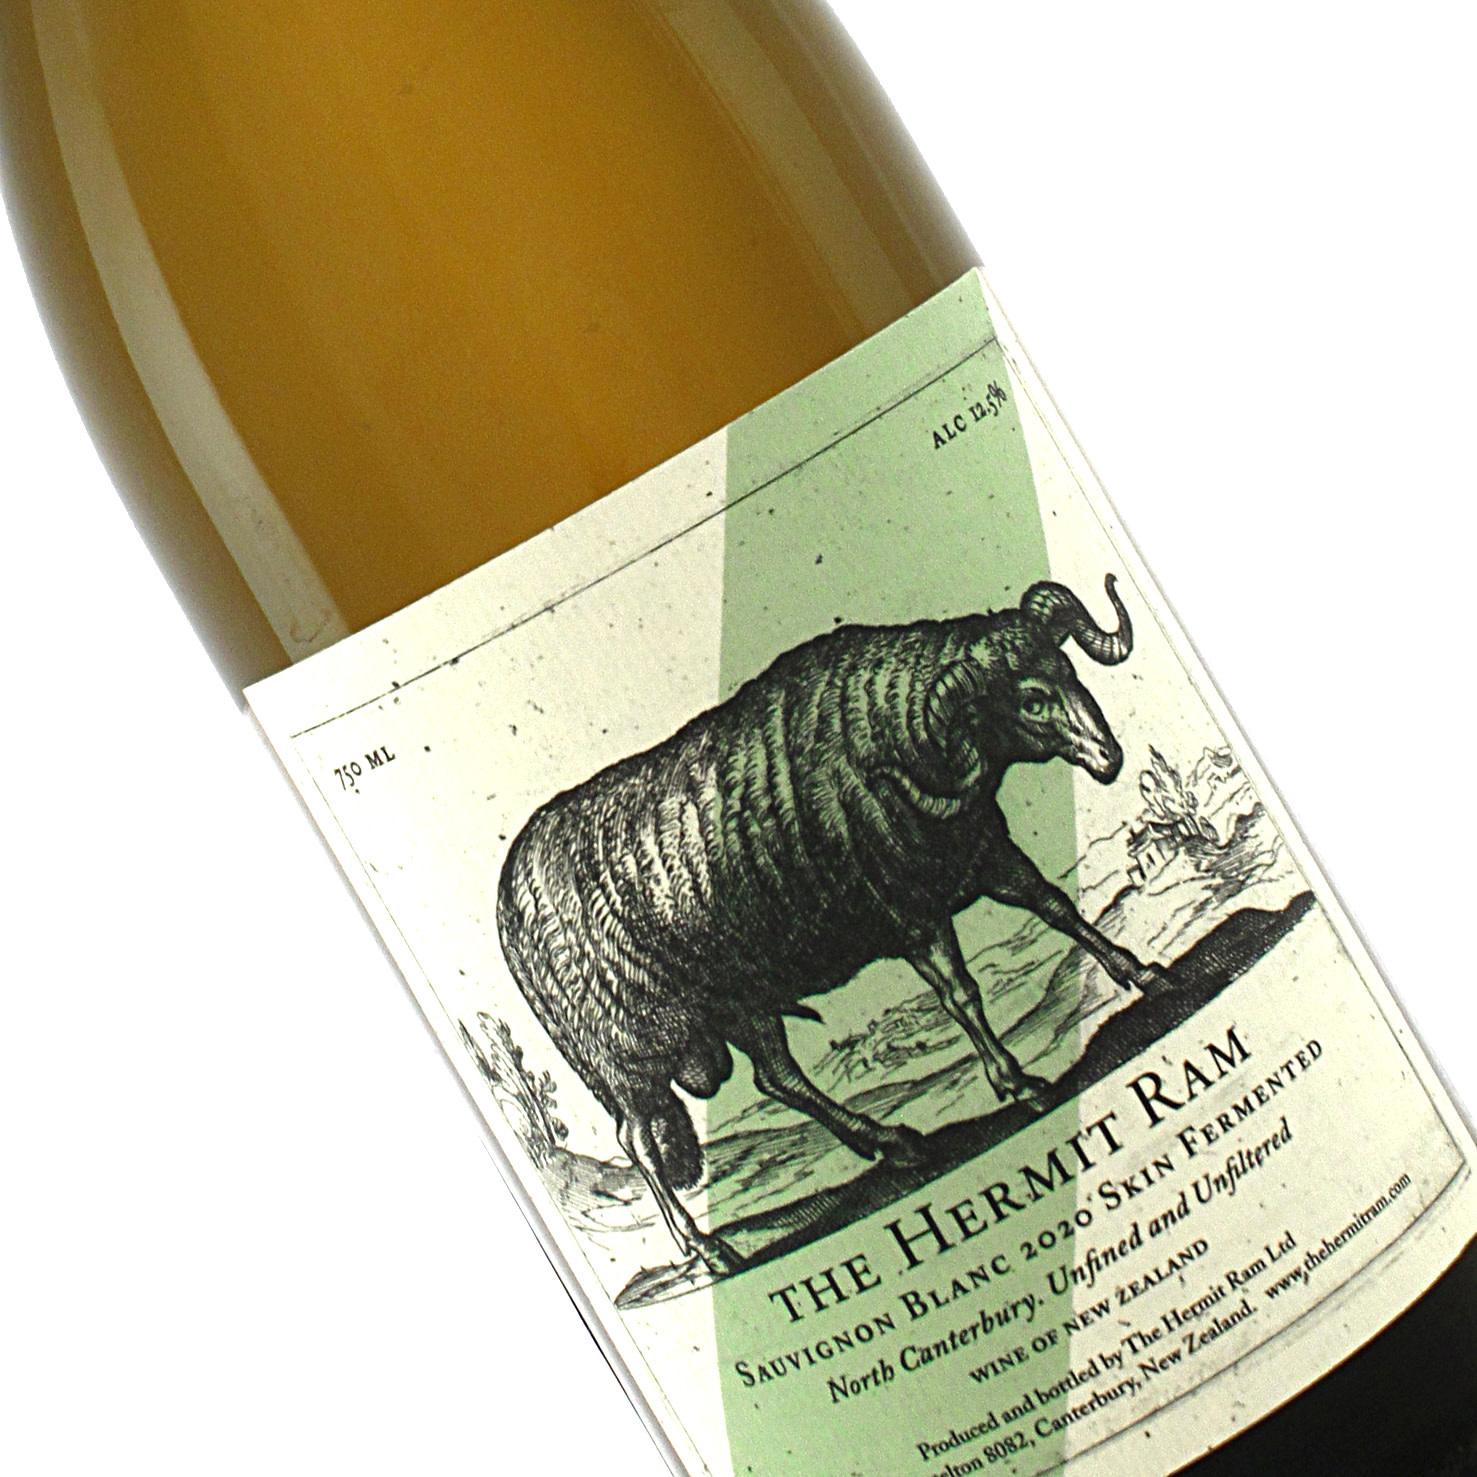 The Hermit Ram 2020 Sauvignon Blanc Skin Fermented, New Zealand